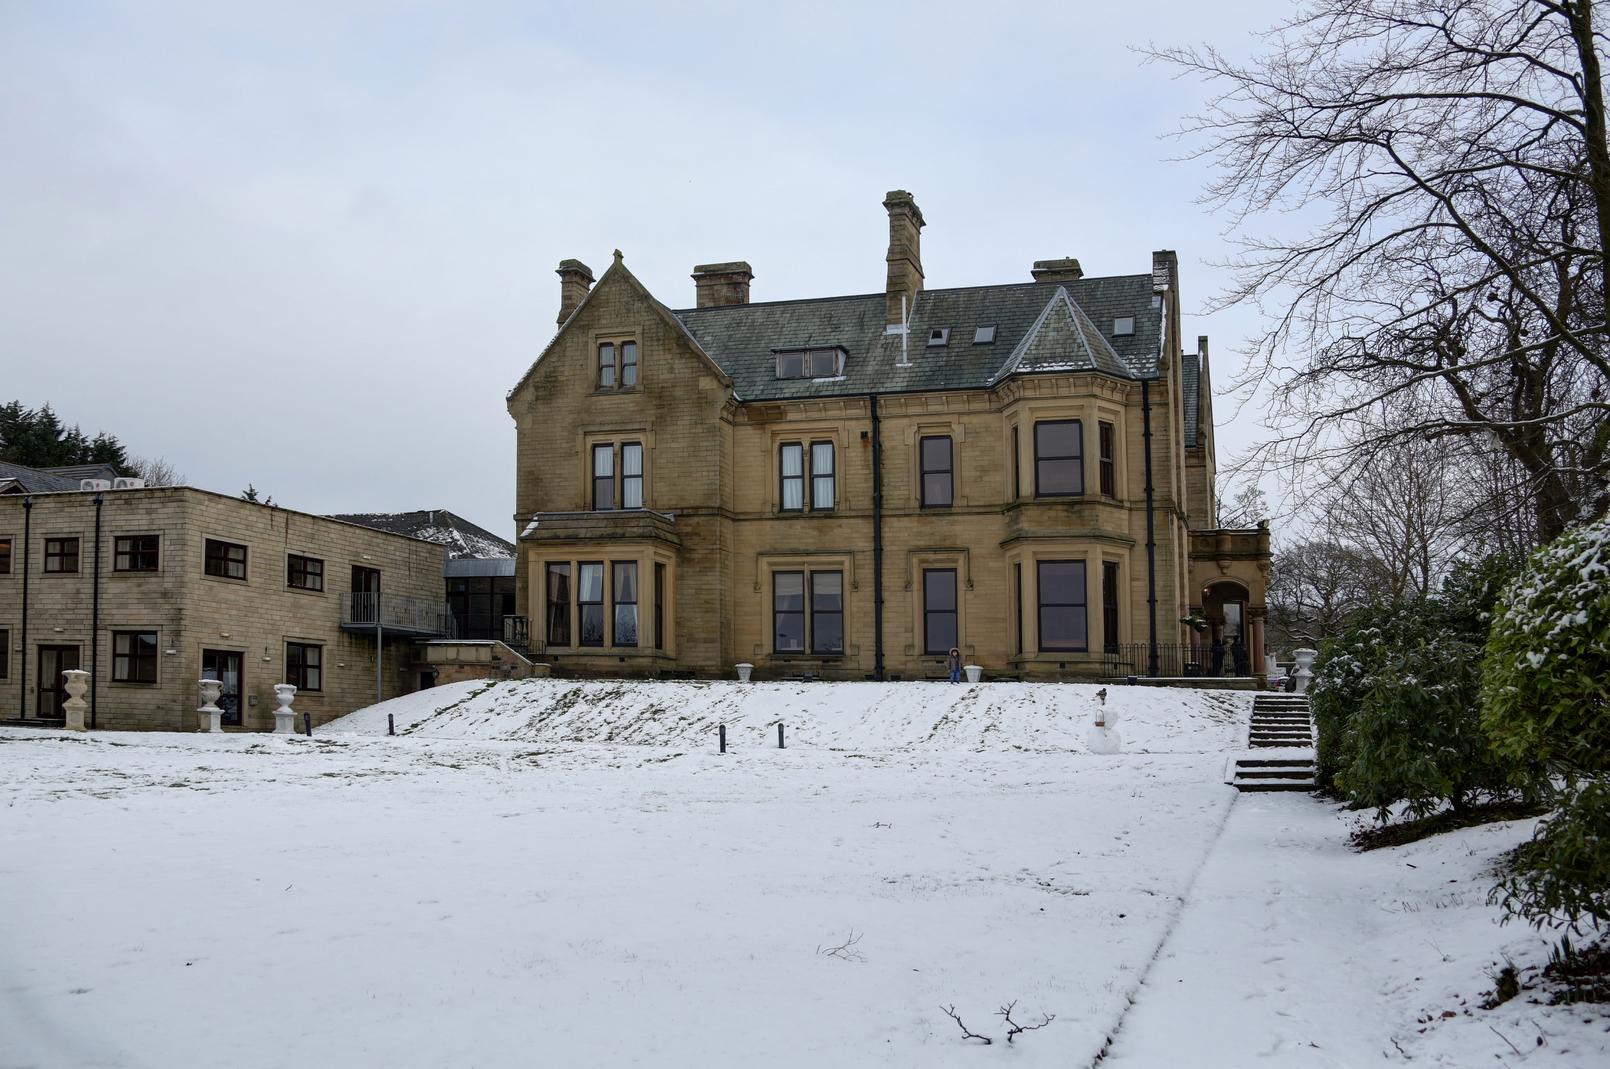 Best western burnley north oaks hotel for Best bathrooms uk burnley